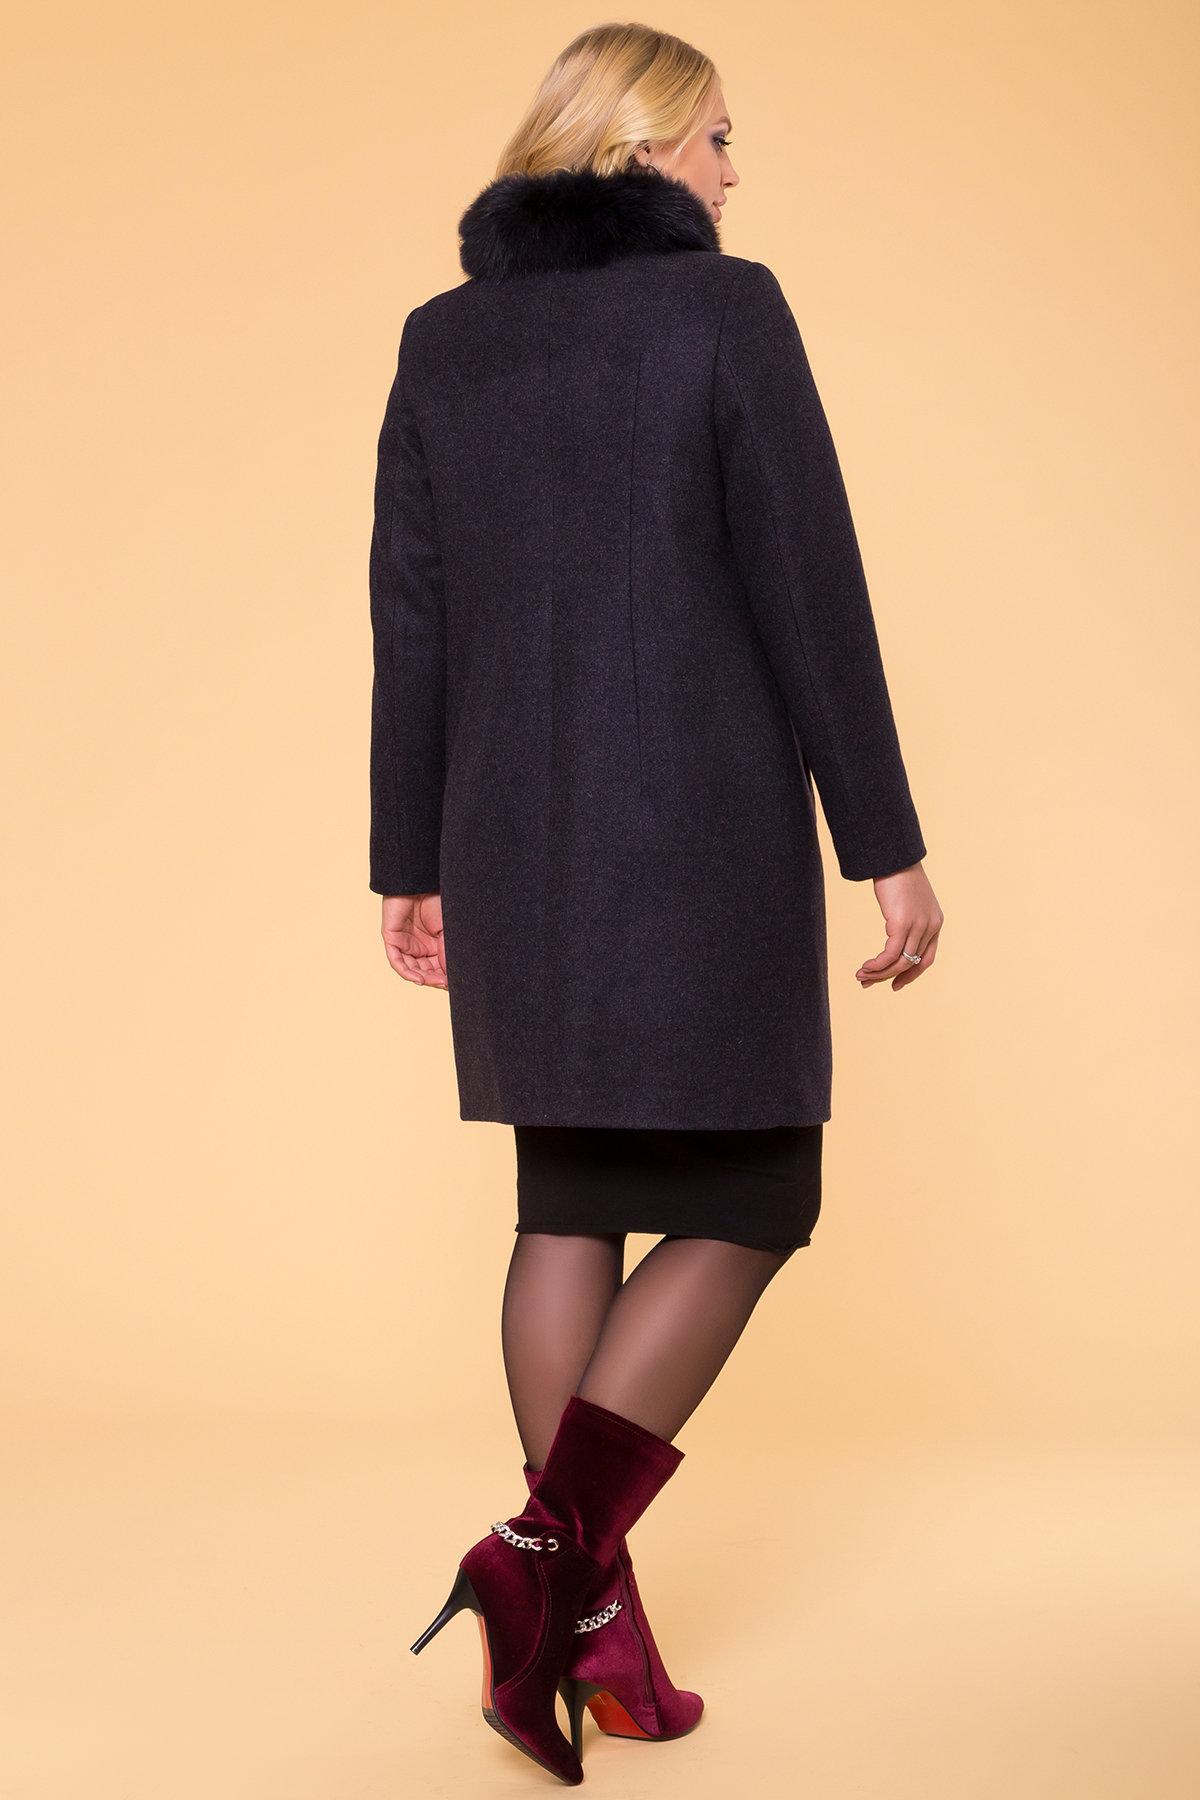 Пальто зима Фортуна лайт Donna 6024 Цвет: Т.синий